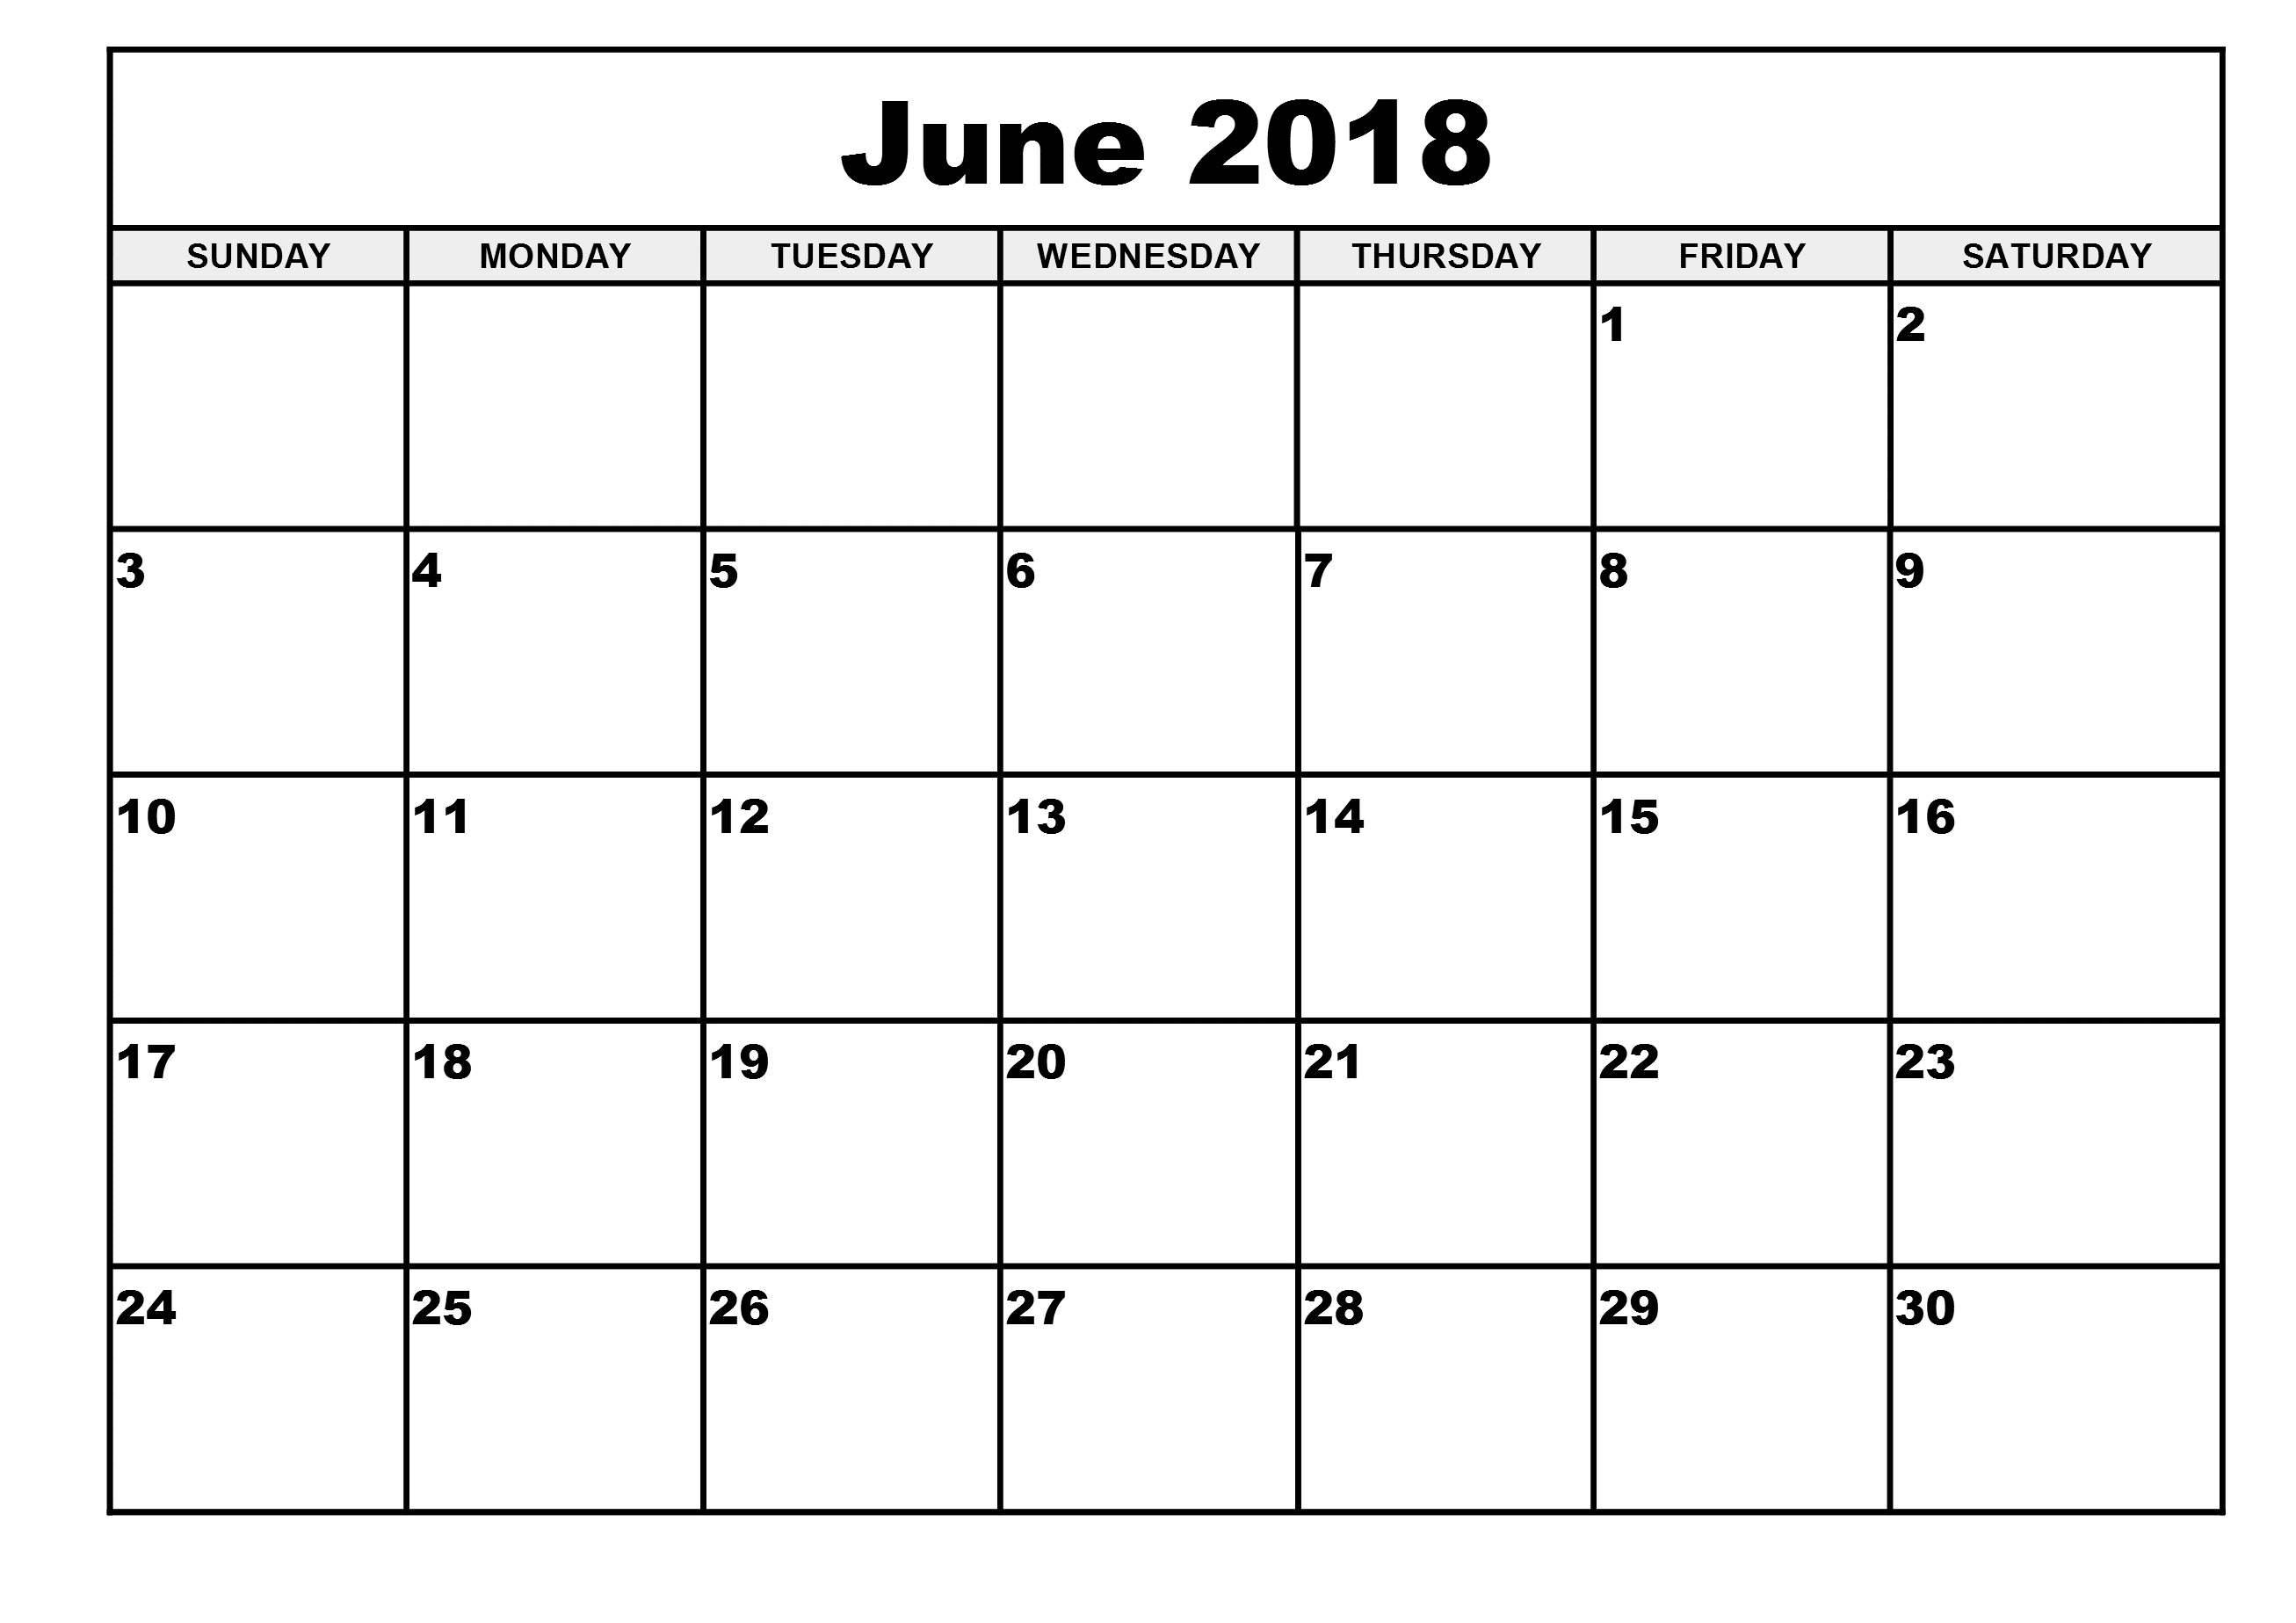 2018 June Monthly Calendar